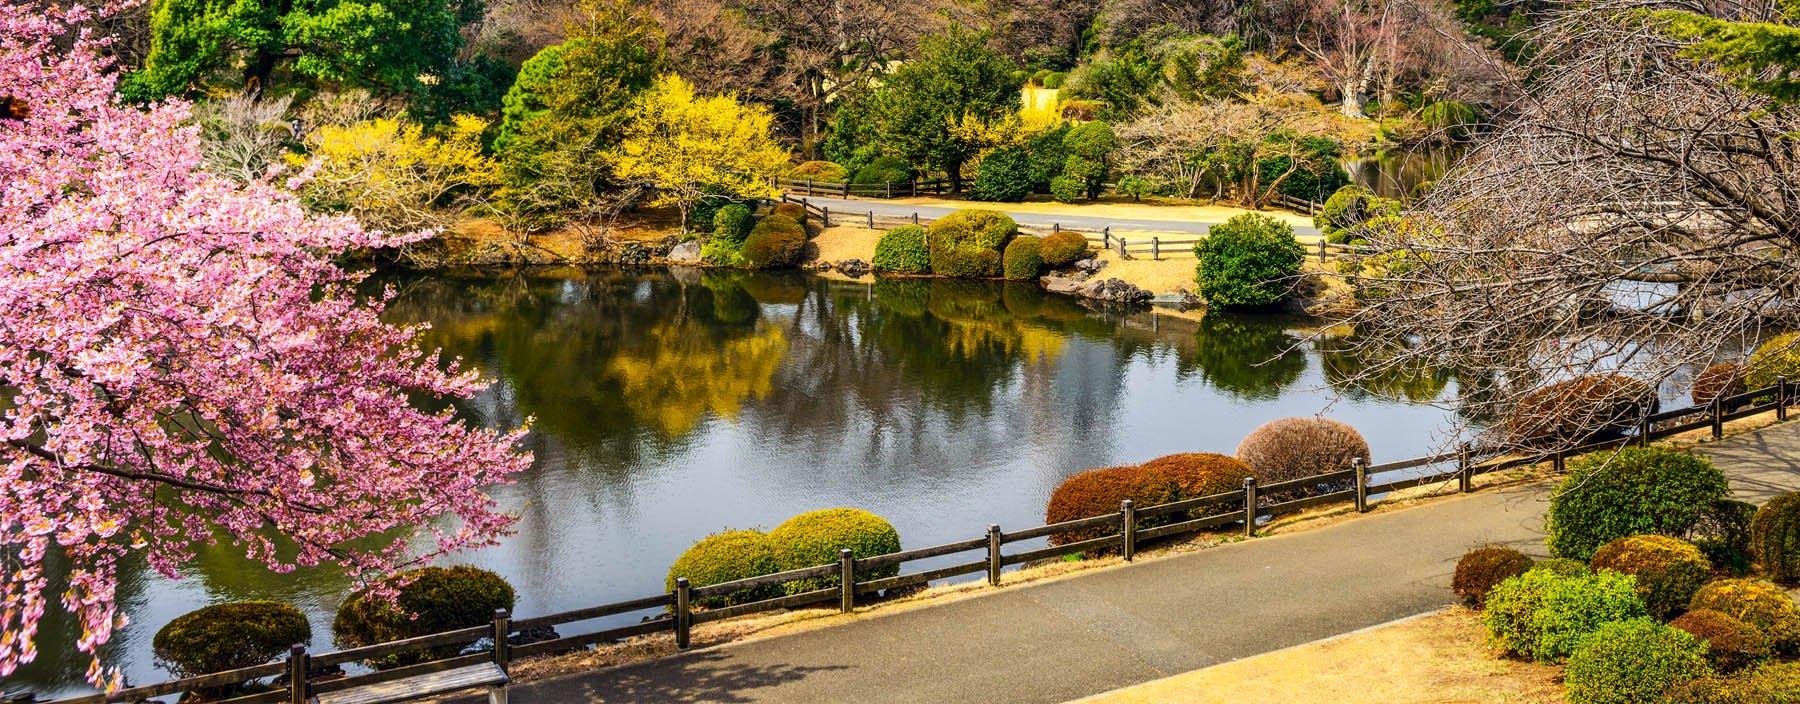 jp, tokyo, shinjuku gyoen park (1).jpg